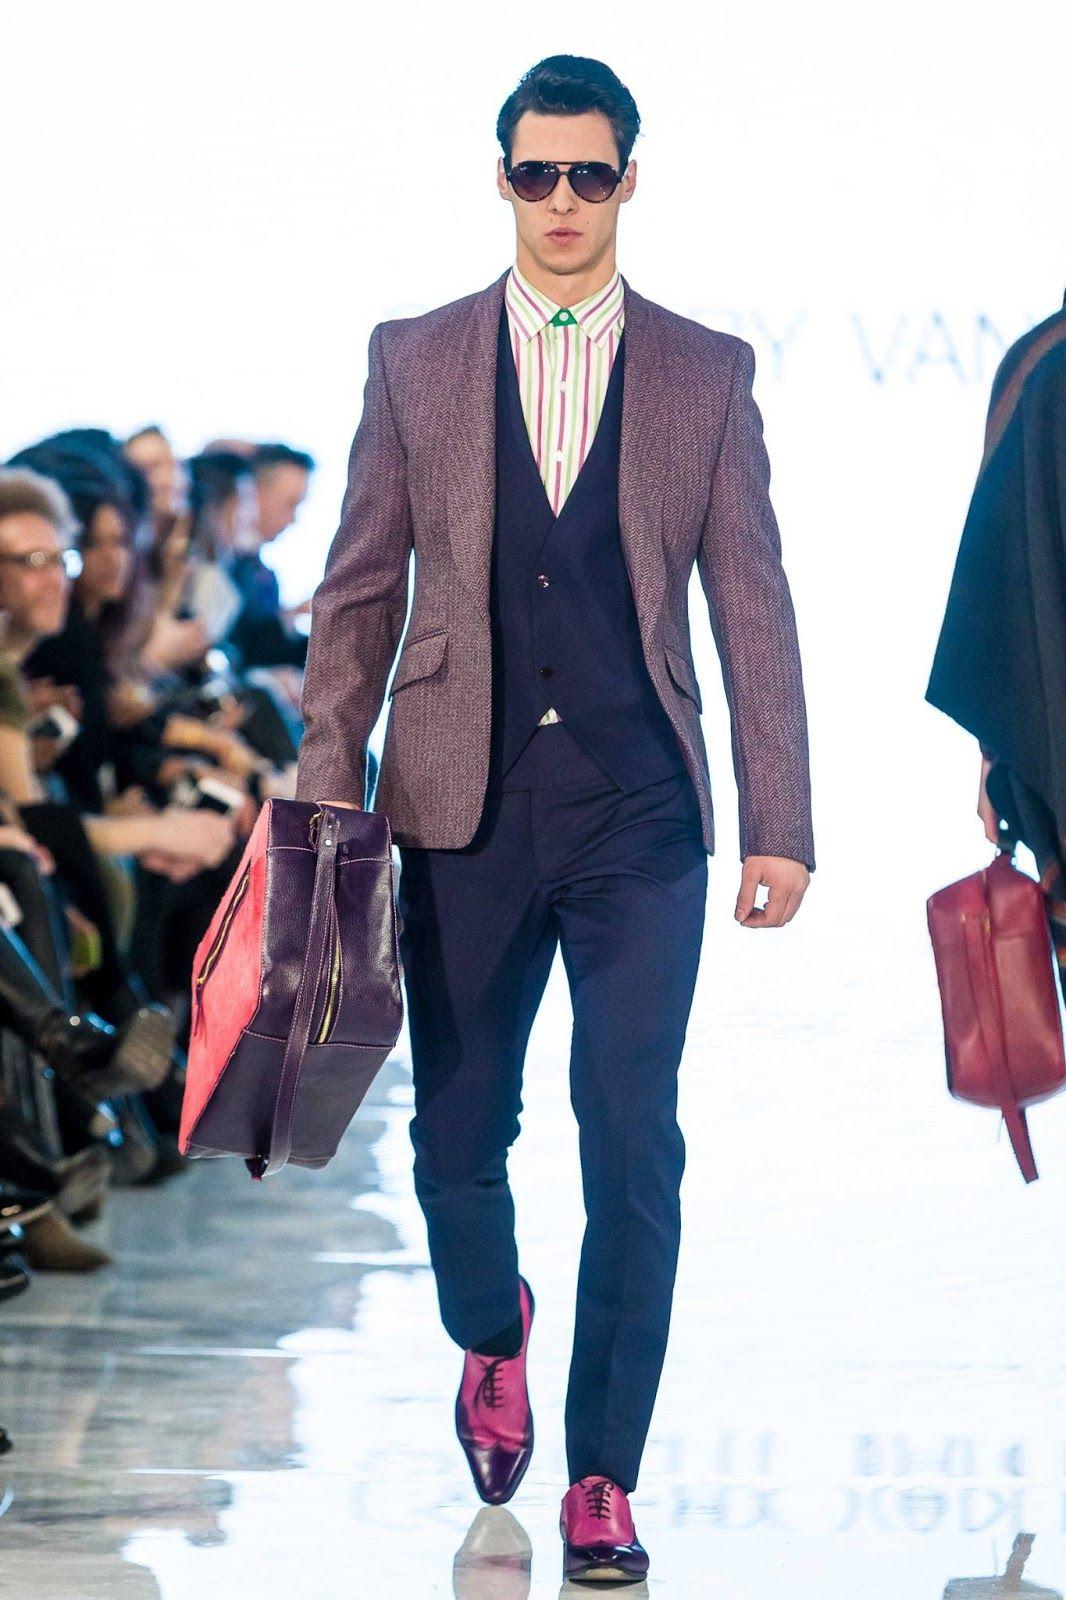 f7a9efddebe Caffery van Horne Fall Winter Otoño Invierno 2016 - Toronto Men s Fashion  Week -  Menswear 3Trends  Tendencias  Moda Hombre - MFT